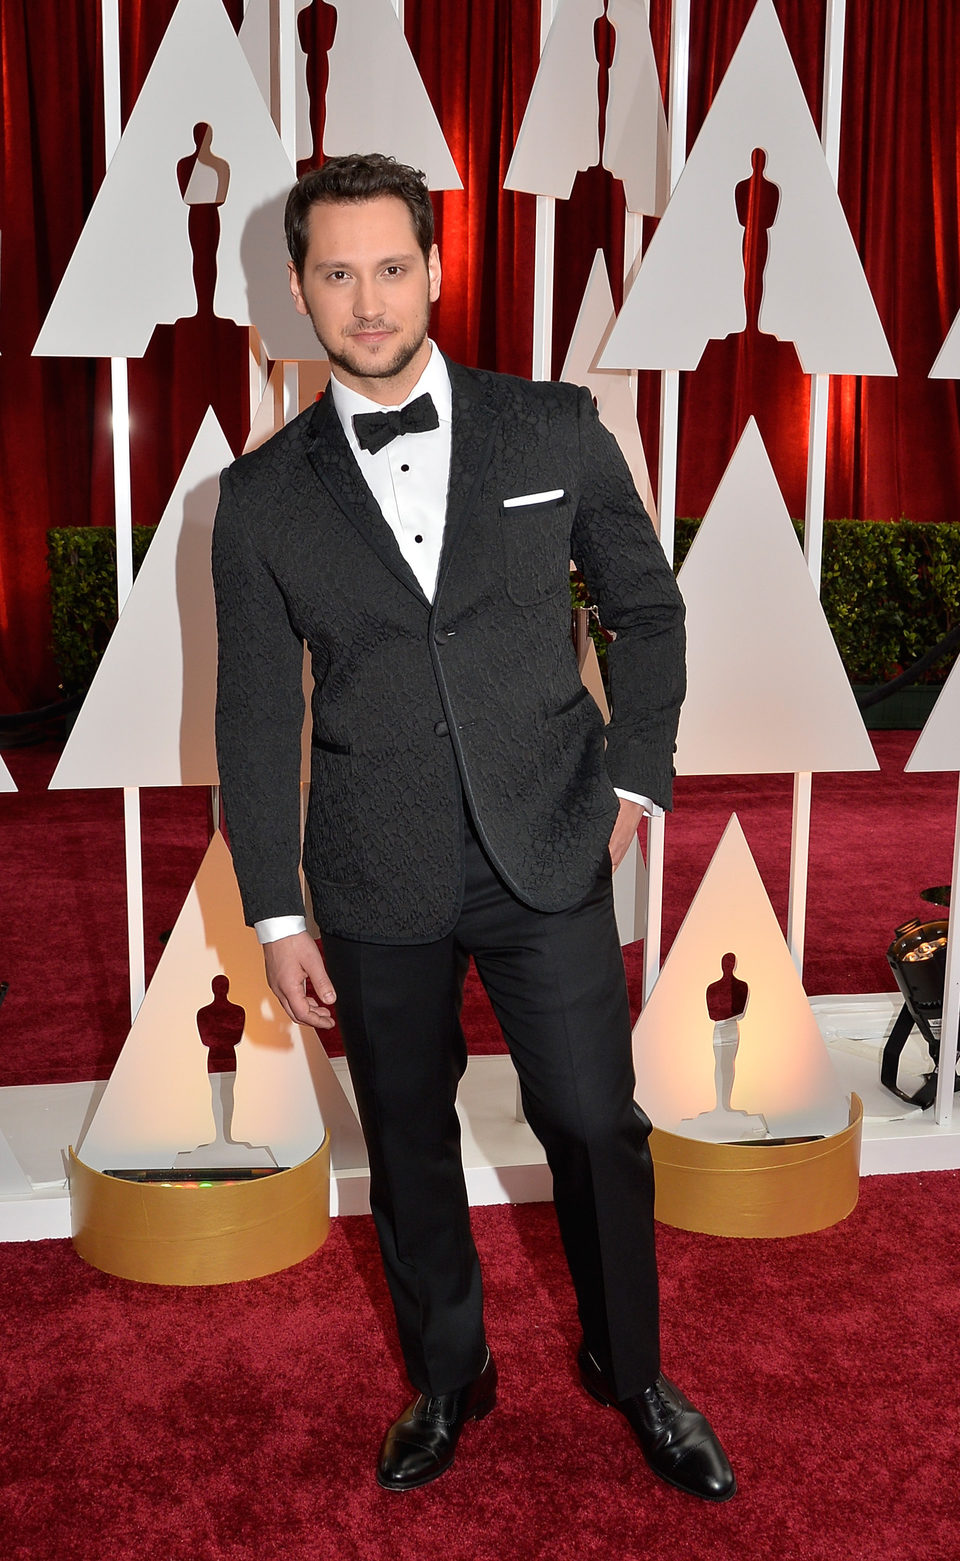 Matt McGorry pose in the red carpet of the Oscar 2015